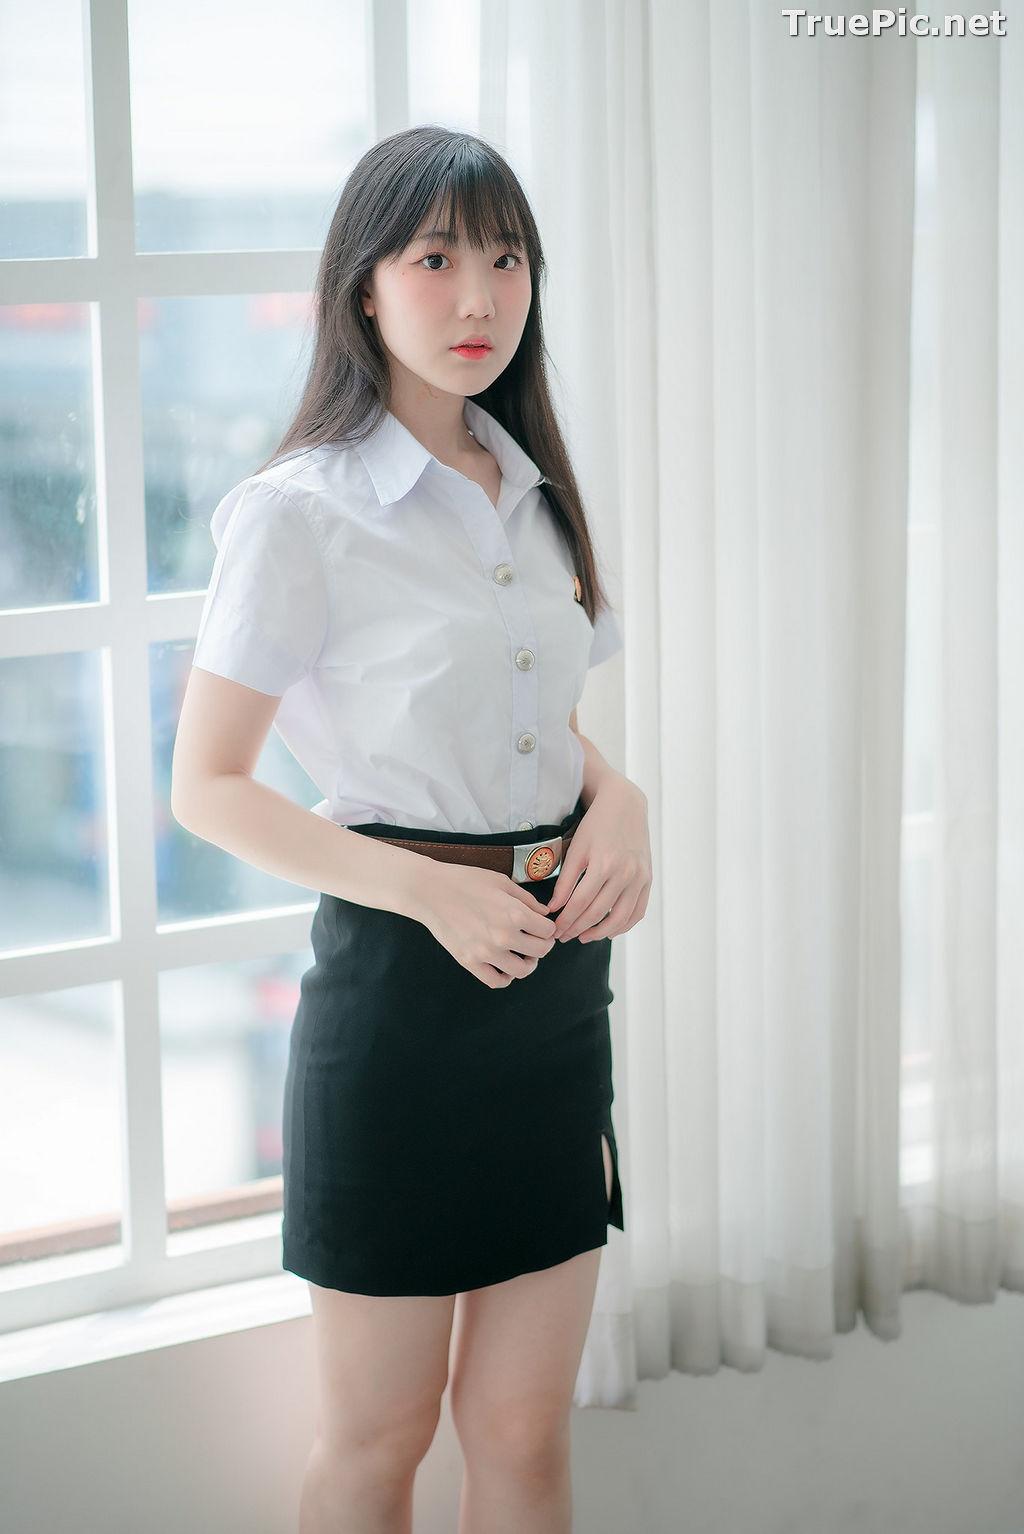 Image Thailand Model - Miki Ariyathanakit - Cute Student Girl - TruePic.net - Picture-5